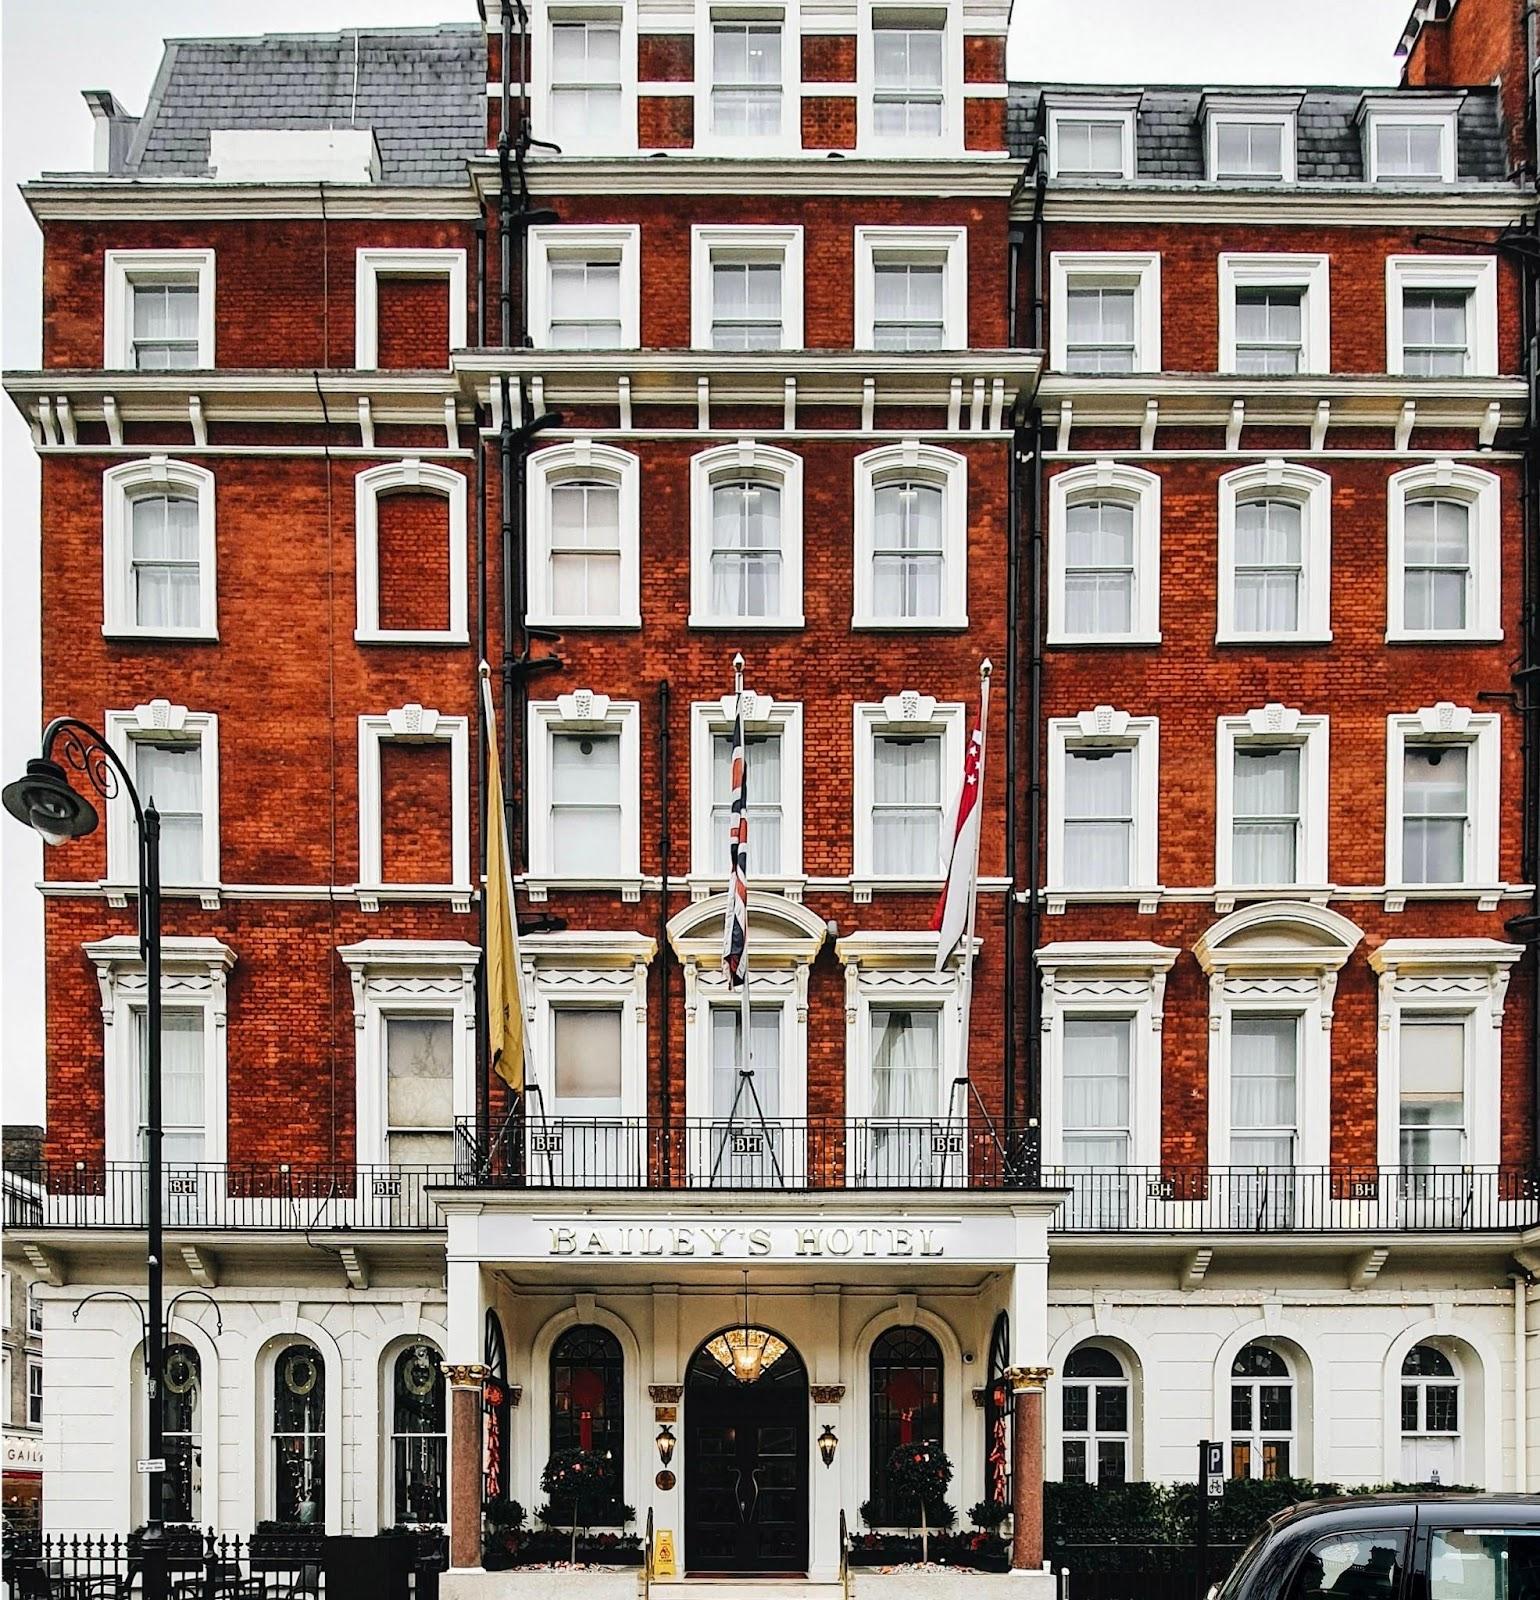 Pemandangan menarik dari NOX Hotels Lancaster Gate, salah satu hotel murah di London